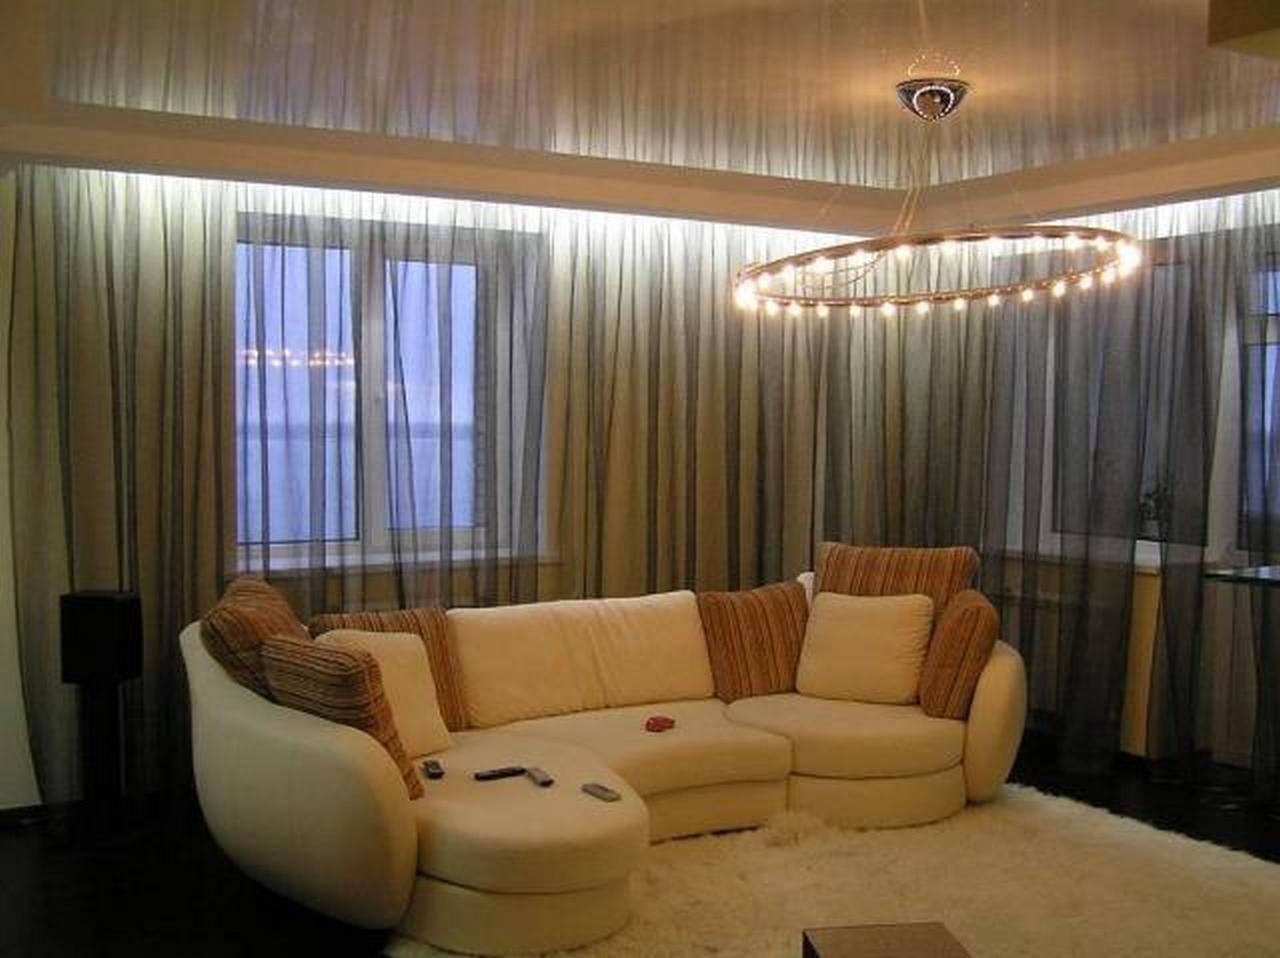 corniche cachee dans le plafond tendu